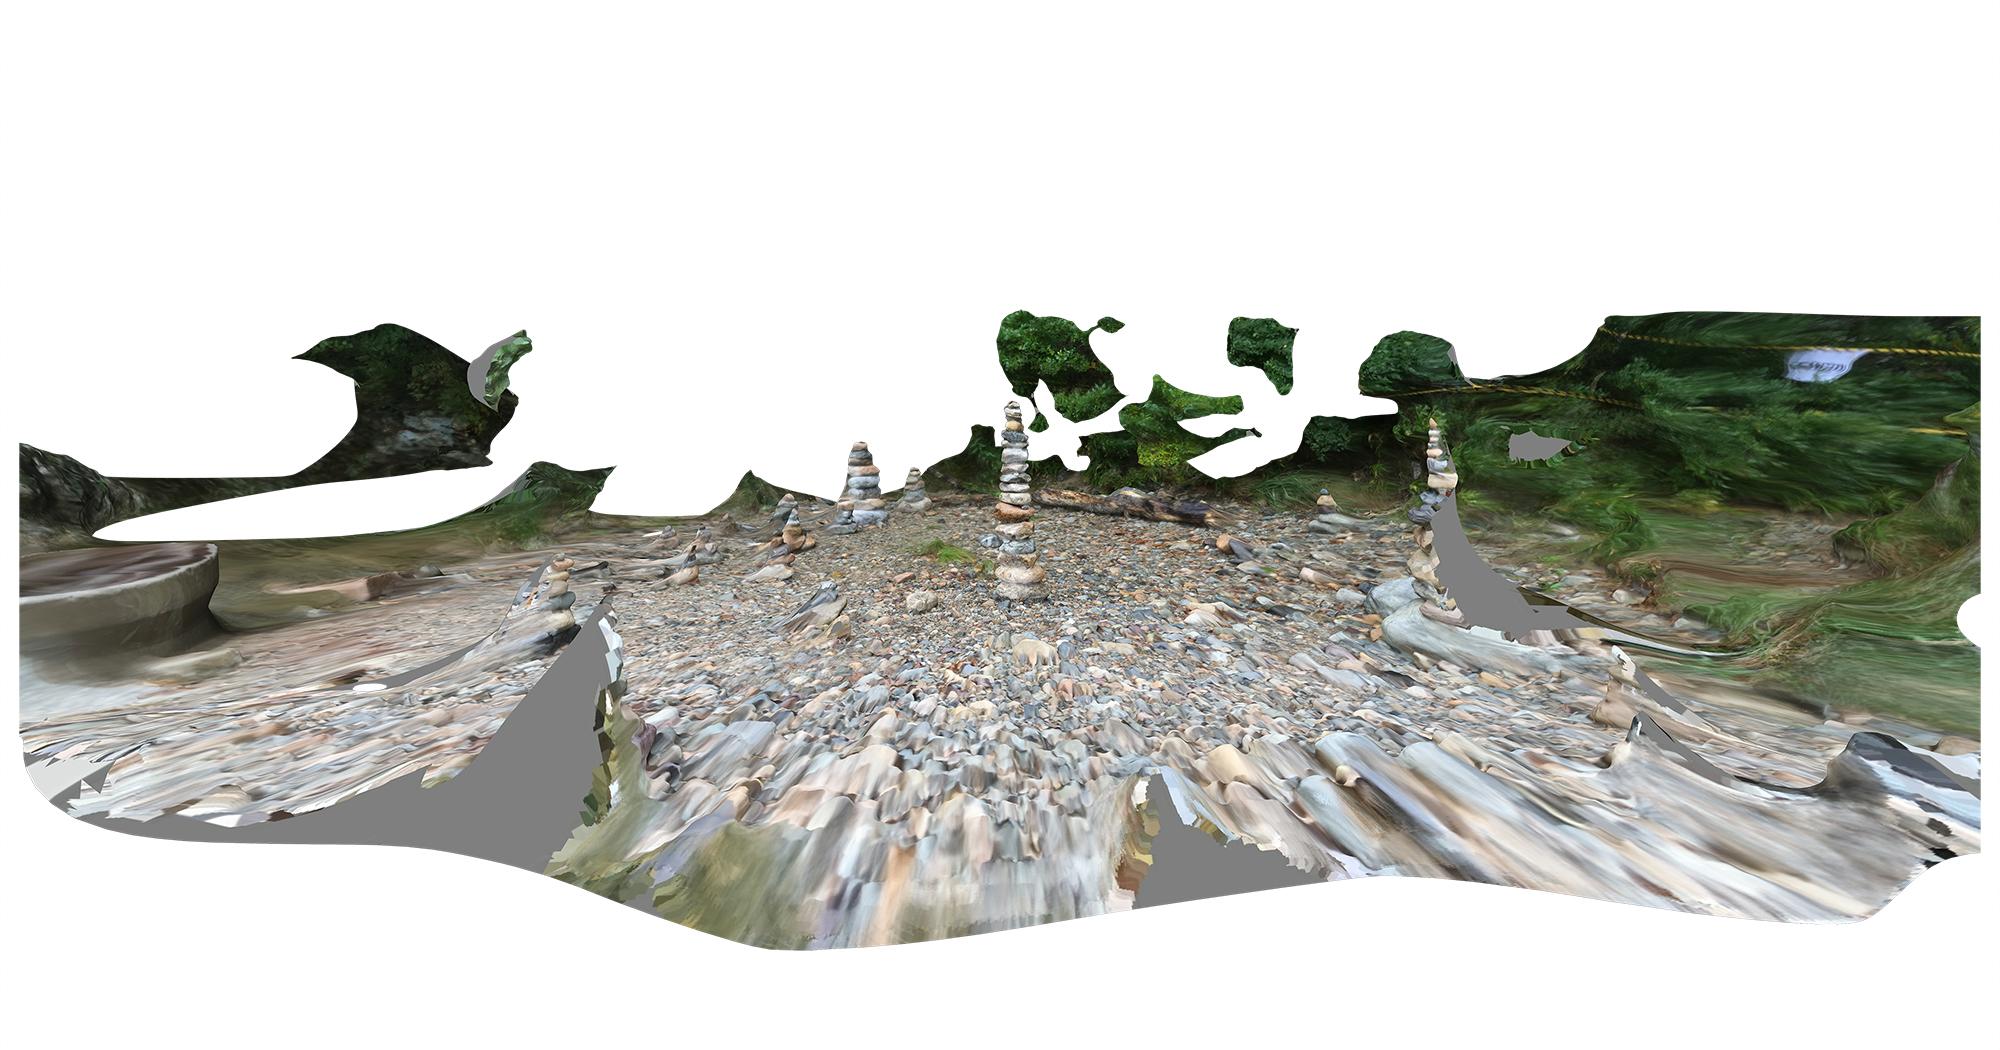 stone9_real 2 (21X40cm 300dpi)